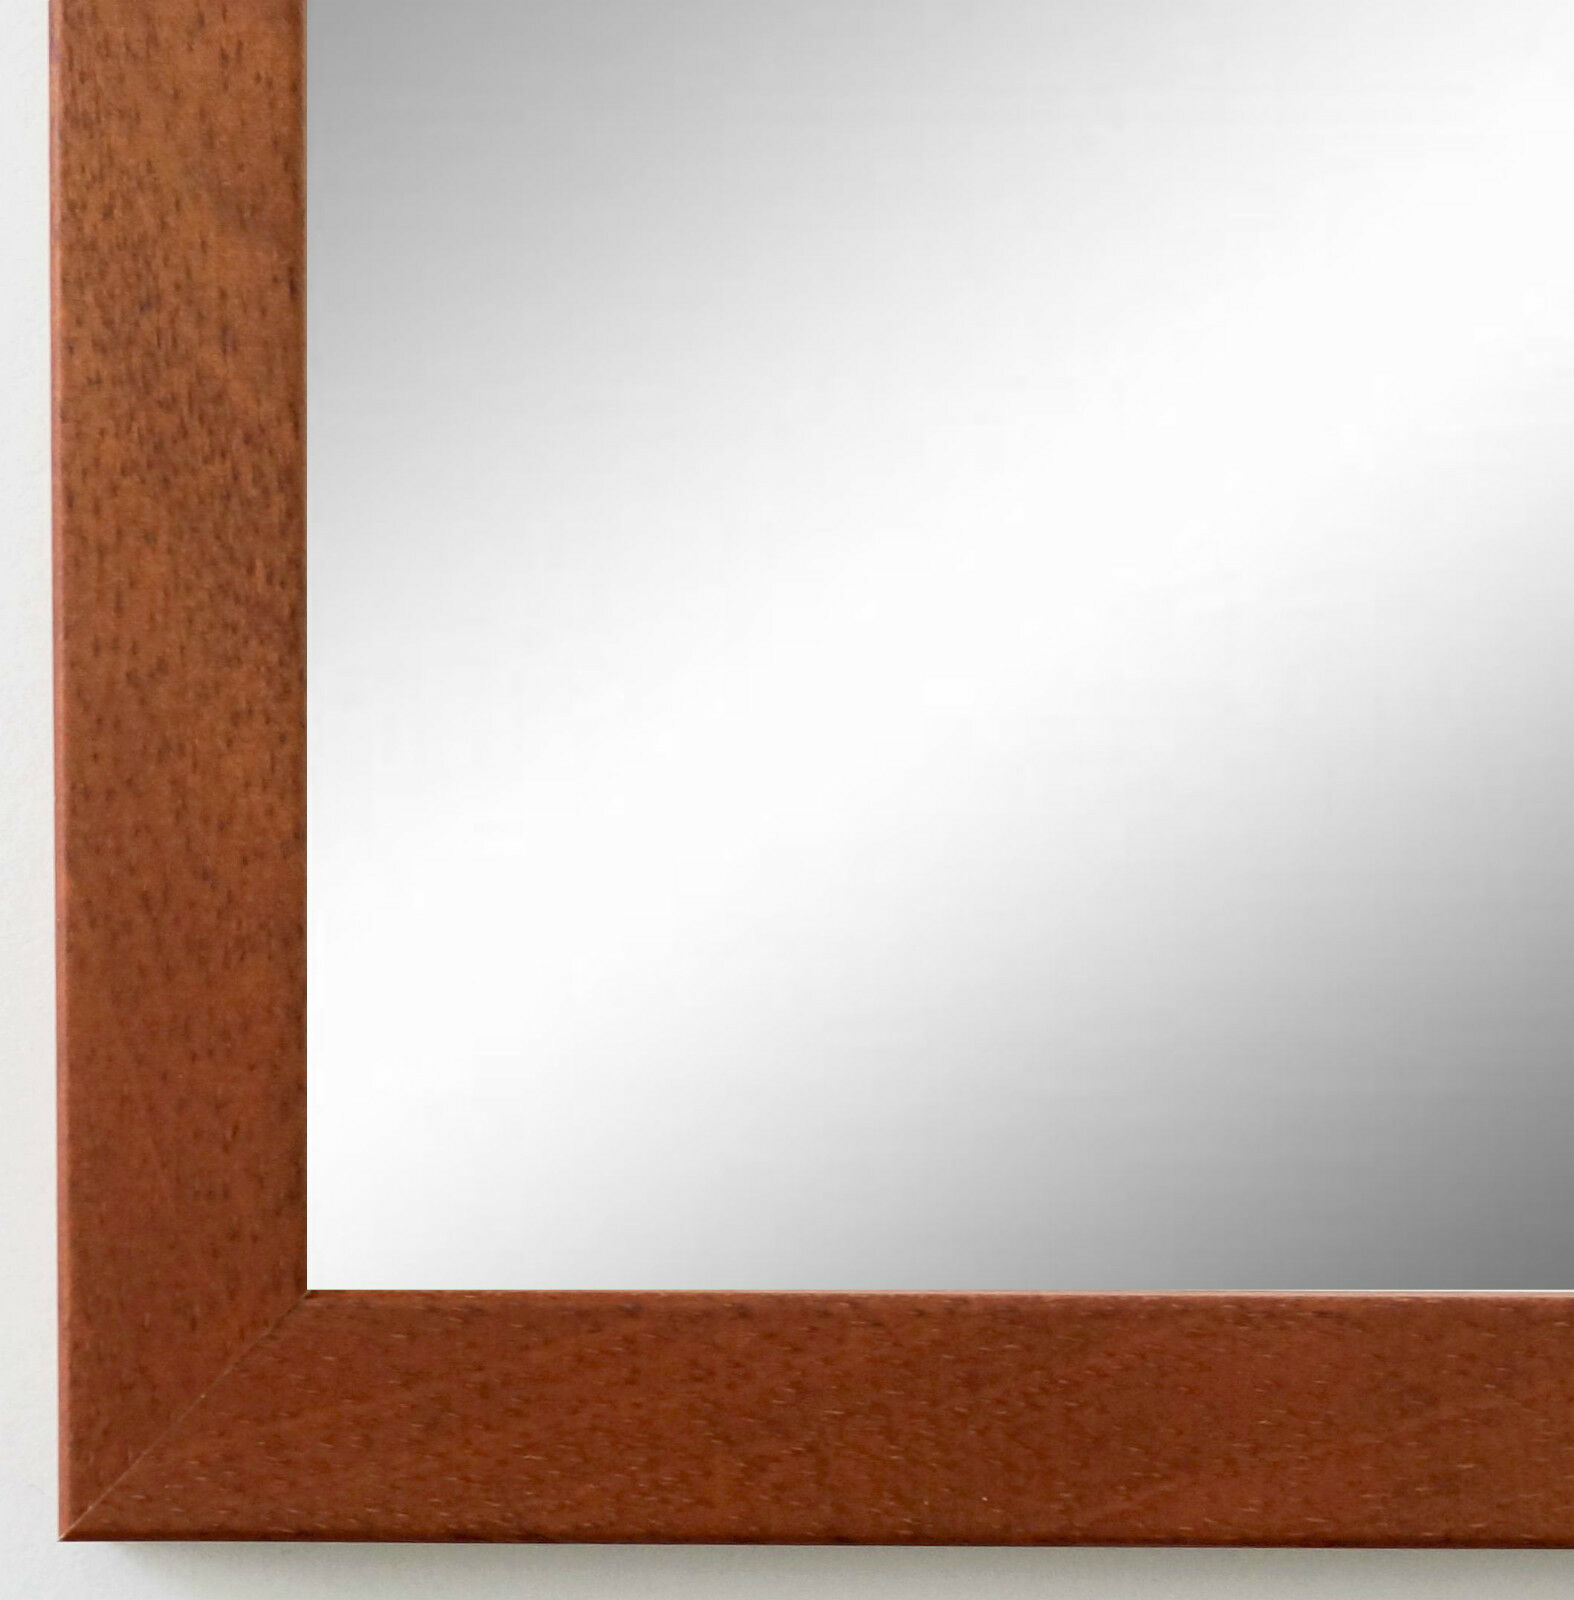 Spiegel Wandspiegel Badspiegel Flur Garderobe Landhaus Neapel Ocker